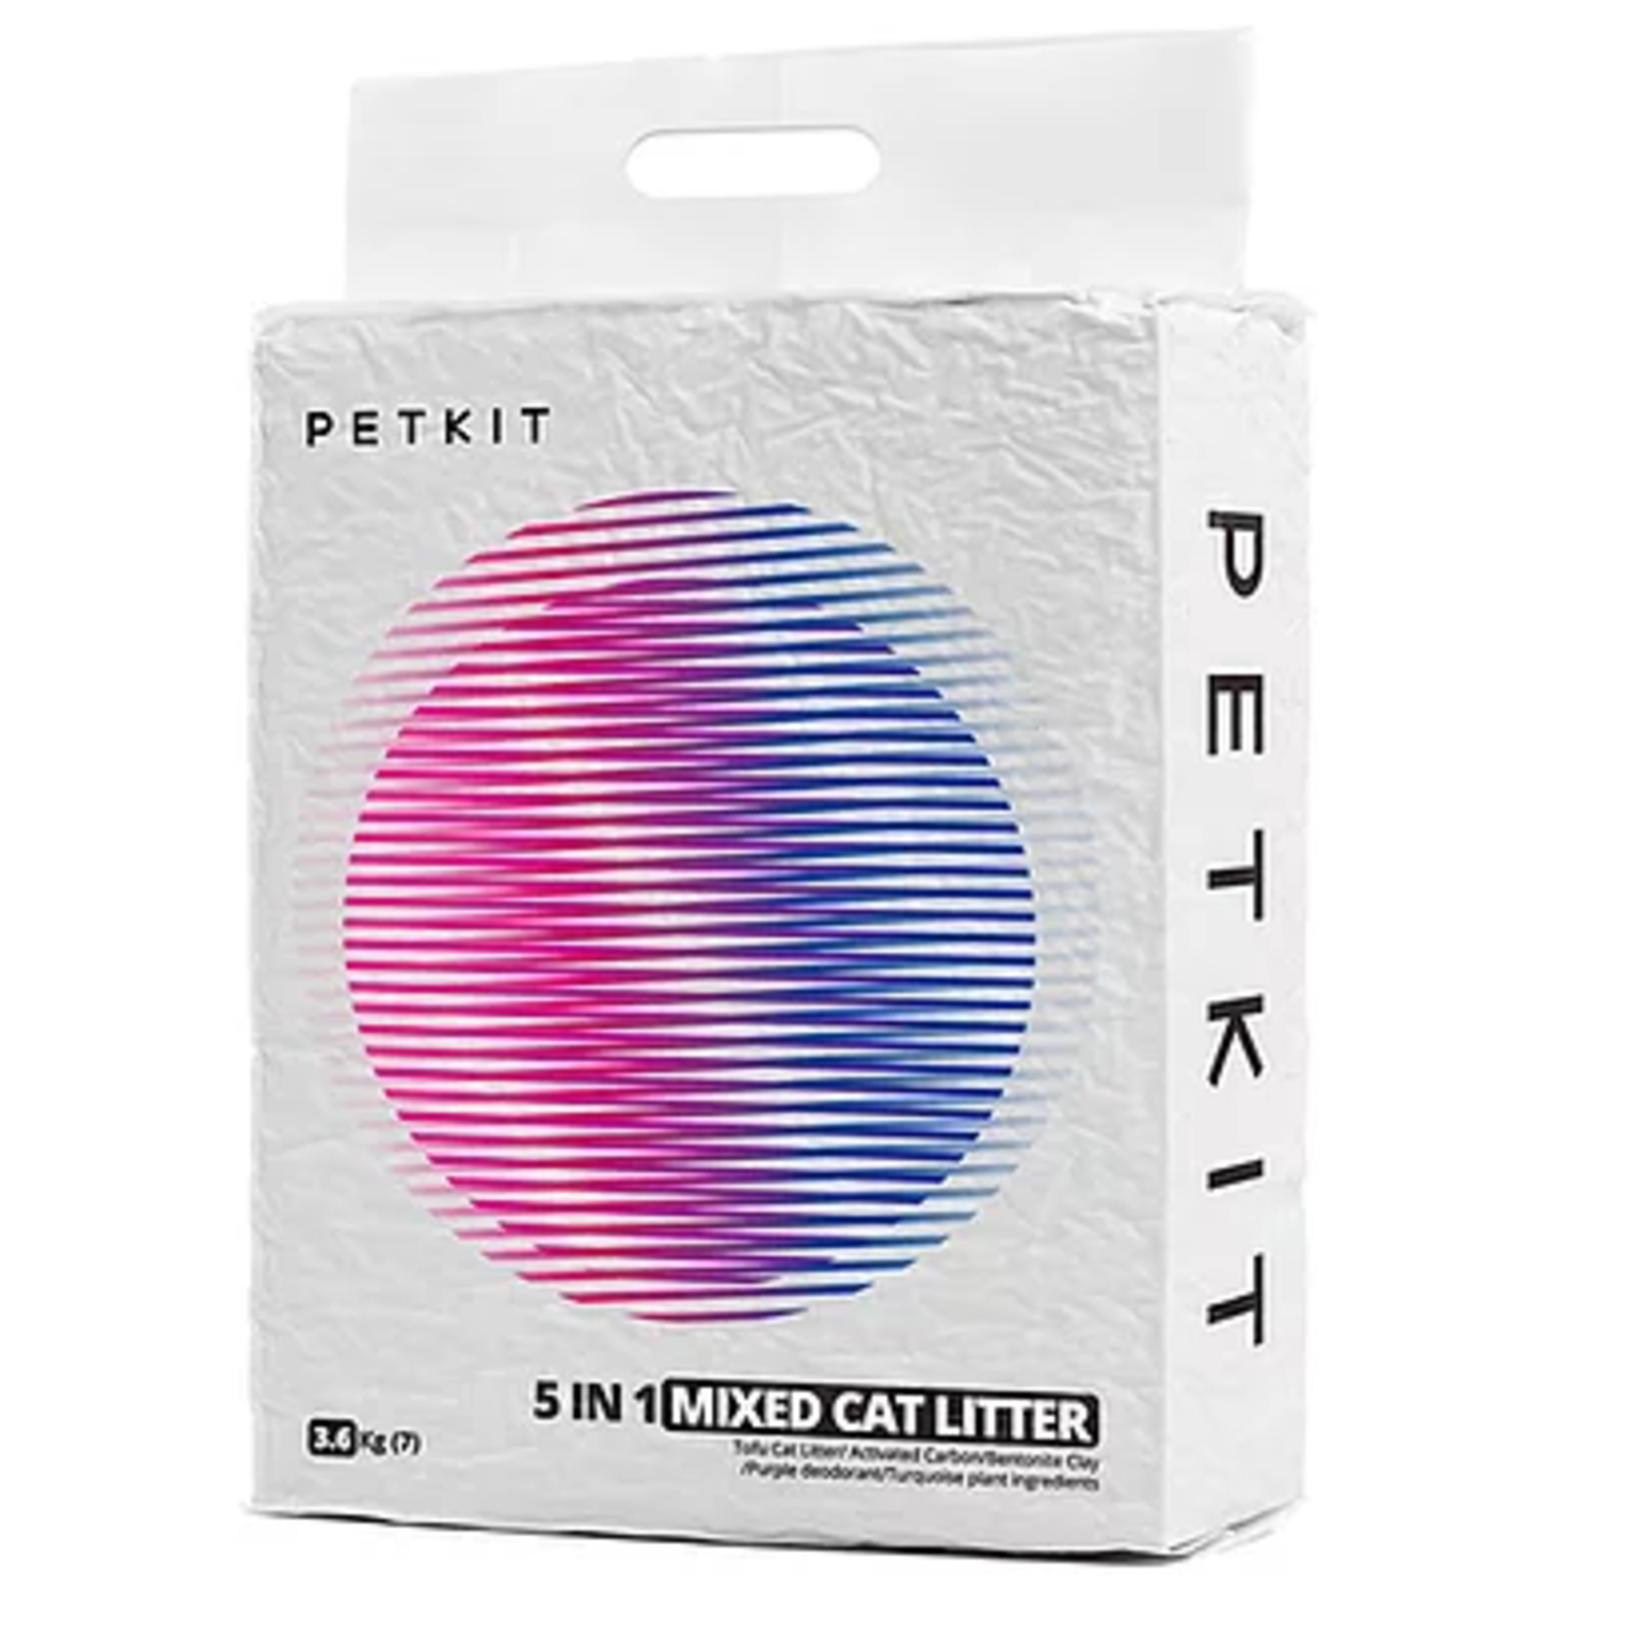 Petkit Mixed (5 in 1): Tofu Litter, Activated Carbon, Bentonite Clay , Purple deodorant , Turquoise plant ingredients